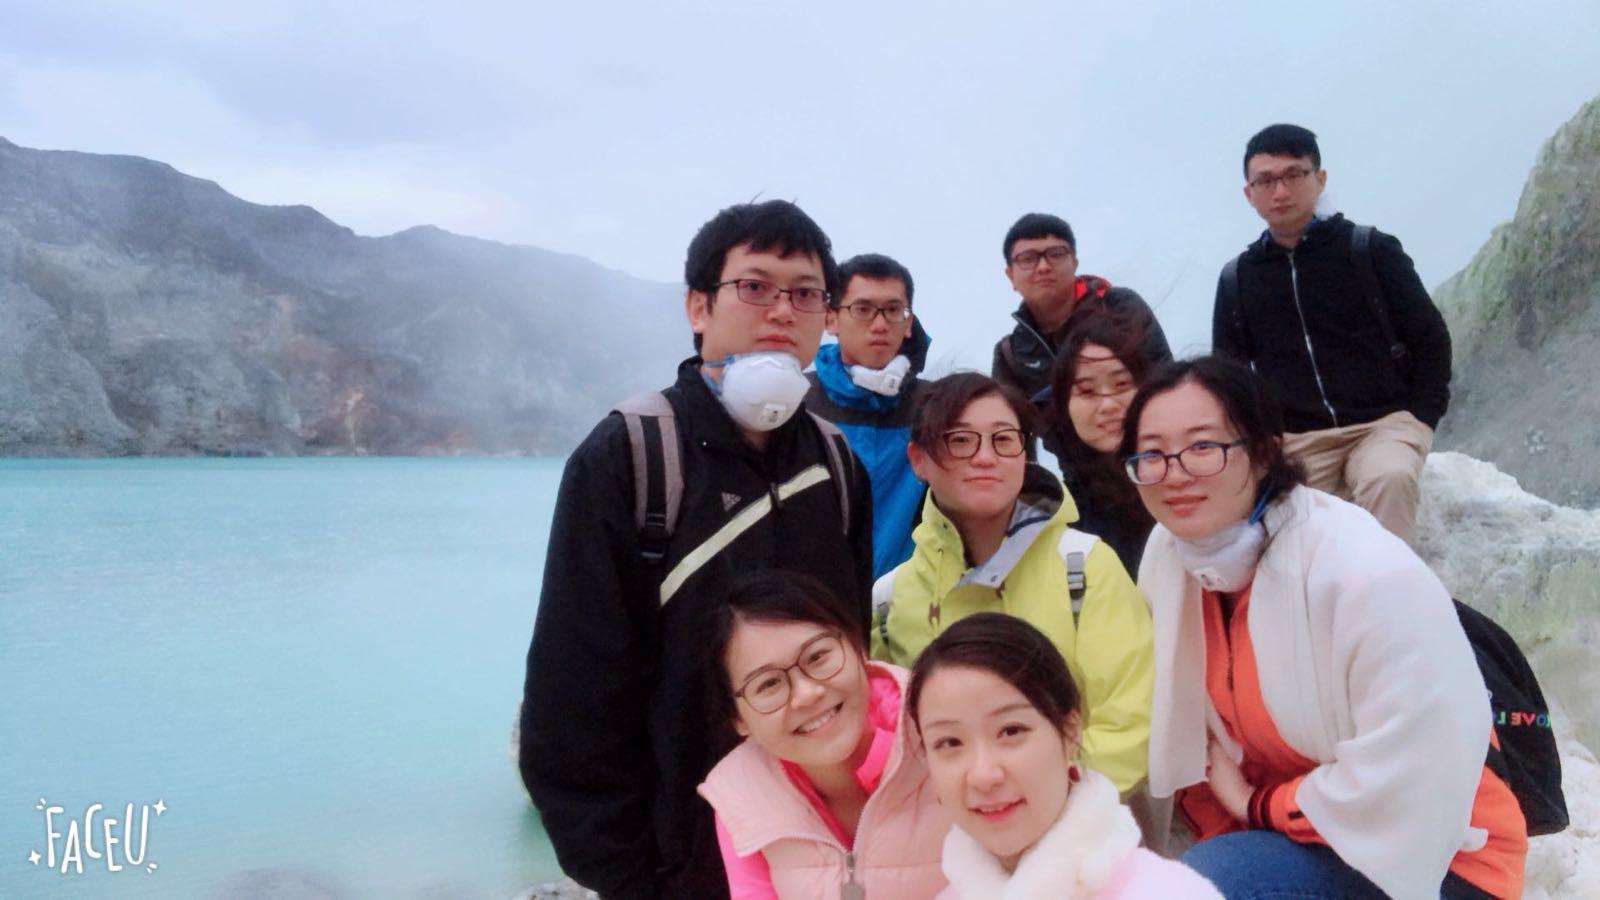 Bromo Asia Travel Private Trip Malang Batu 2h1m Tour Package Ijen Hiking 2d 1n